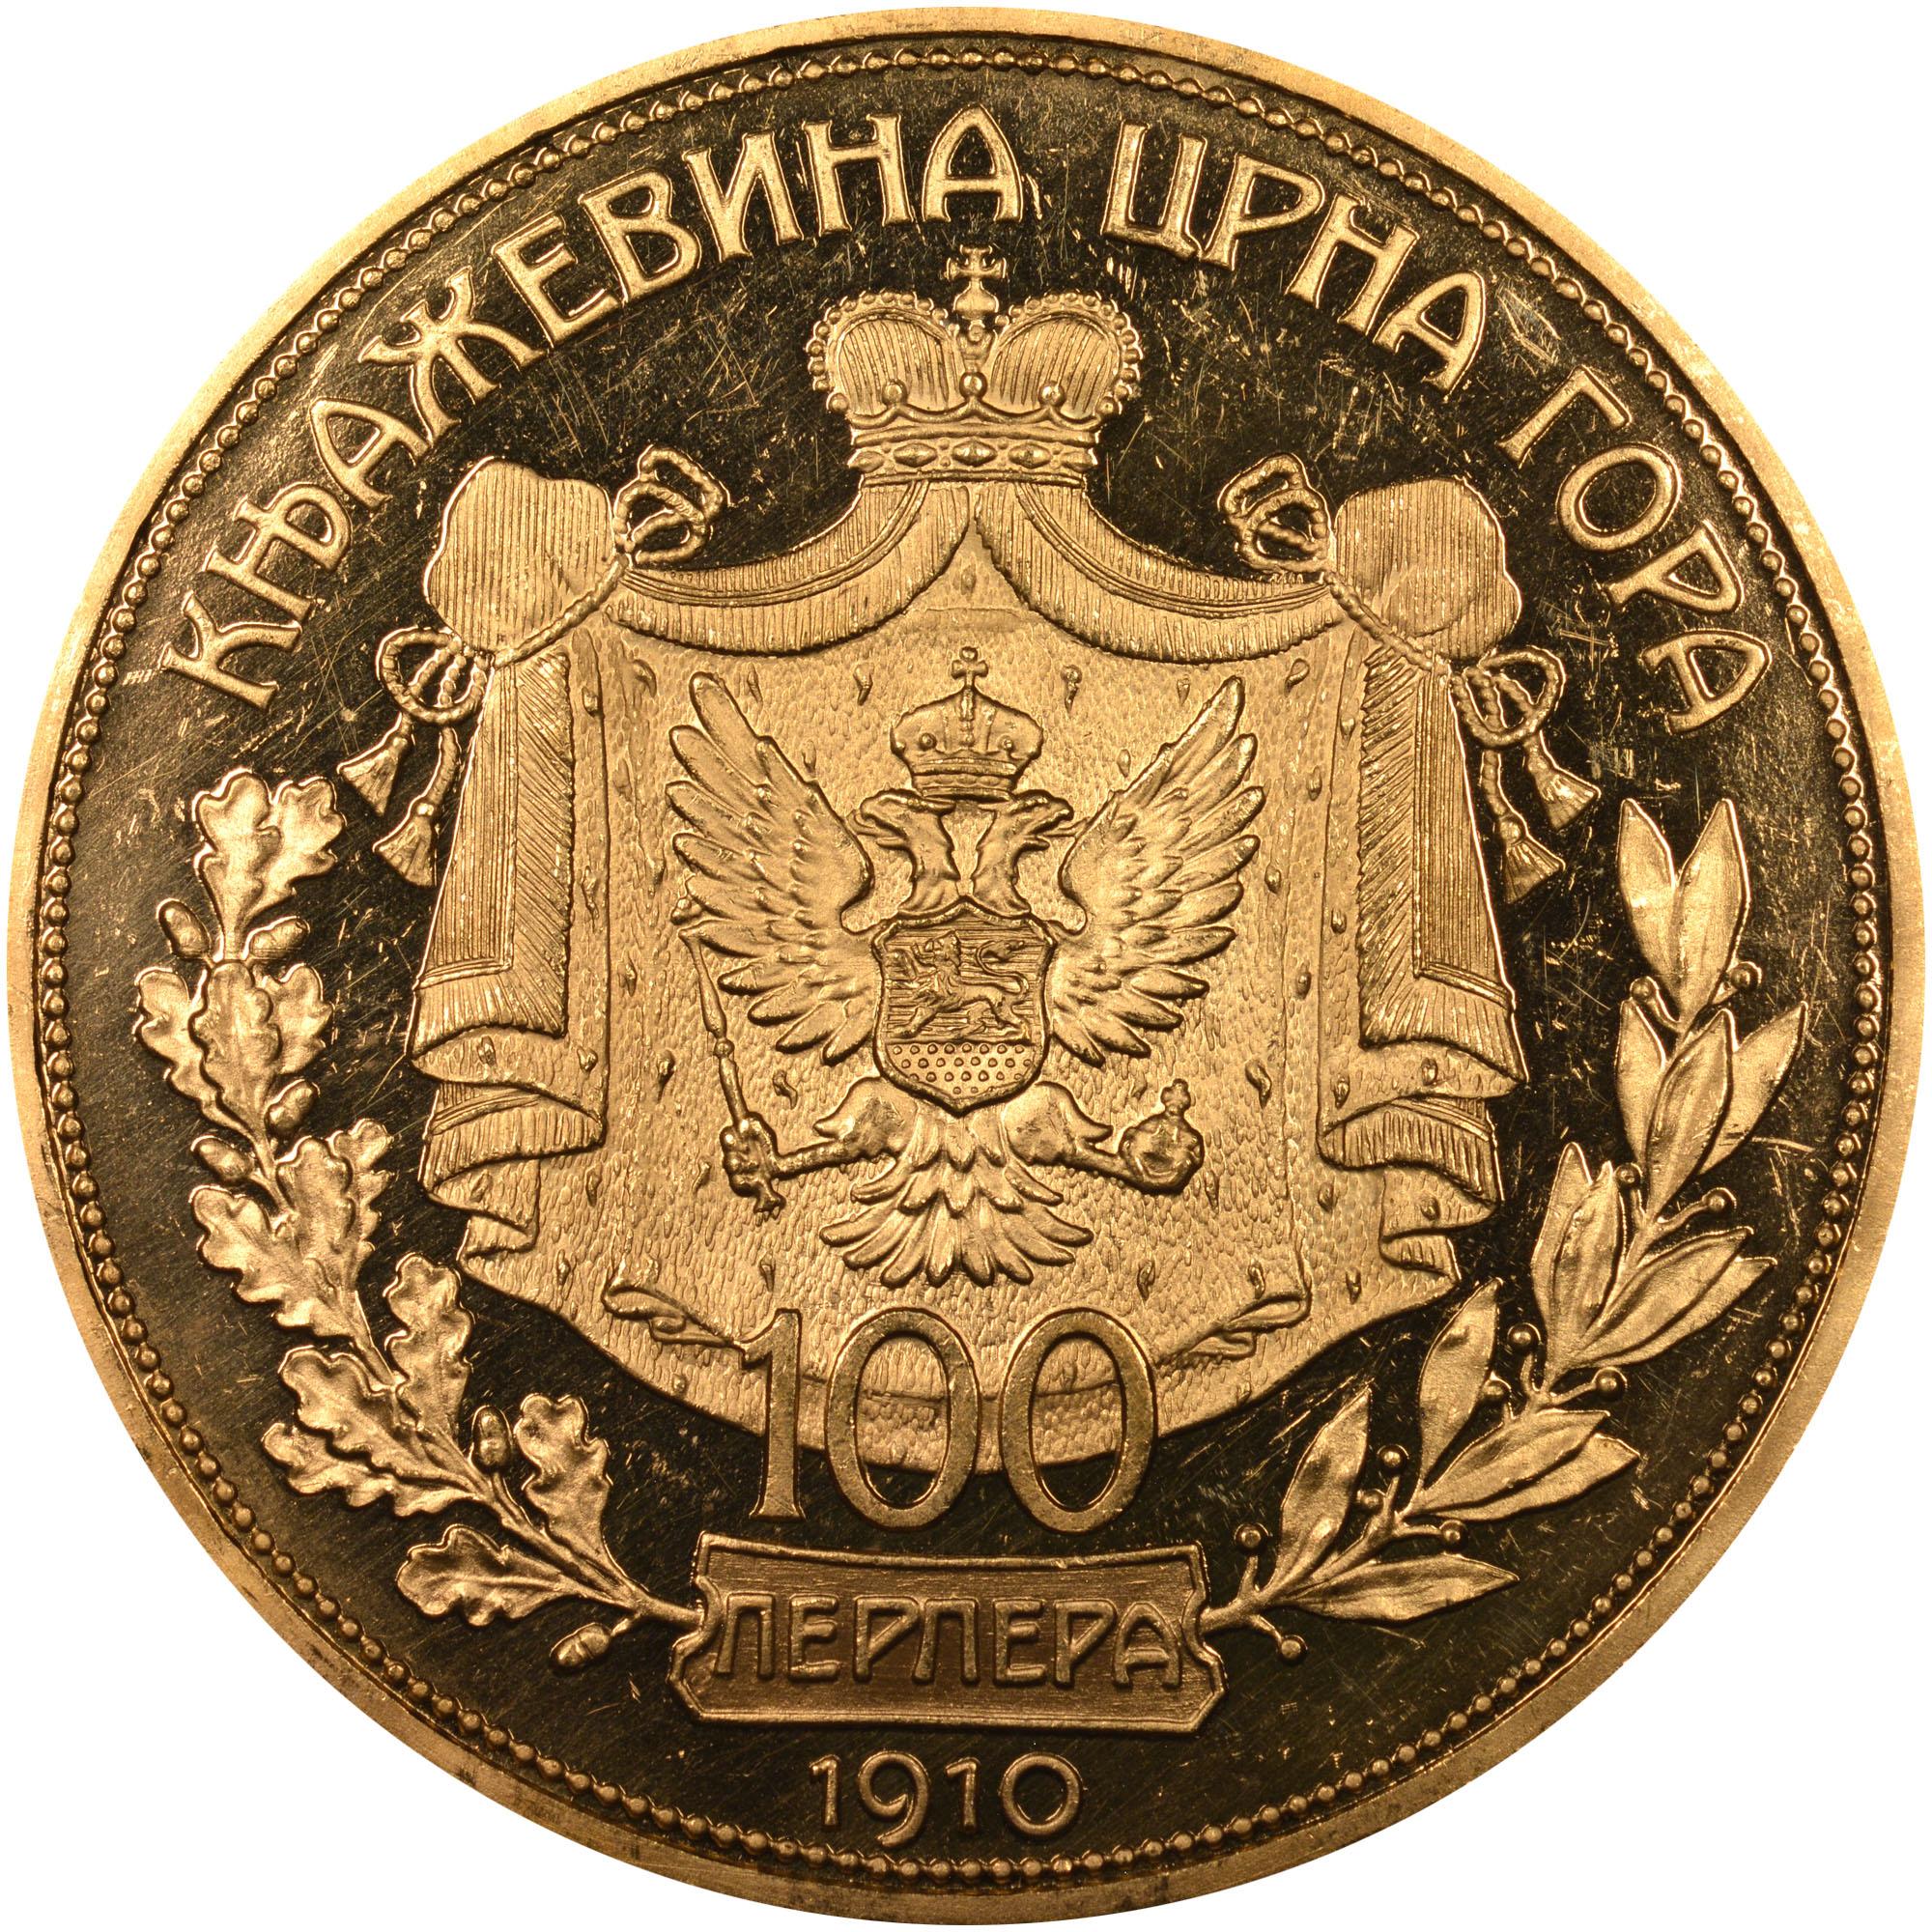 Montenegro 100 Perpera reverse